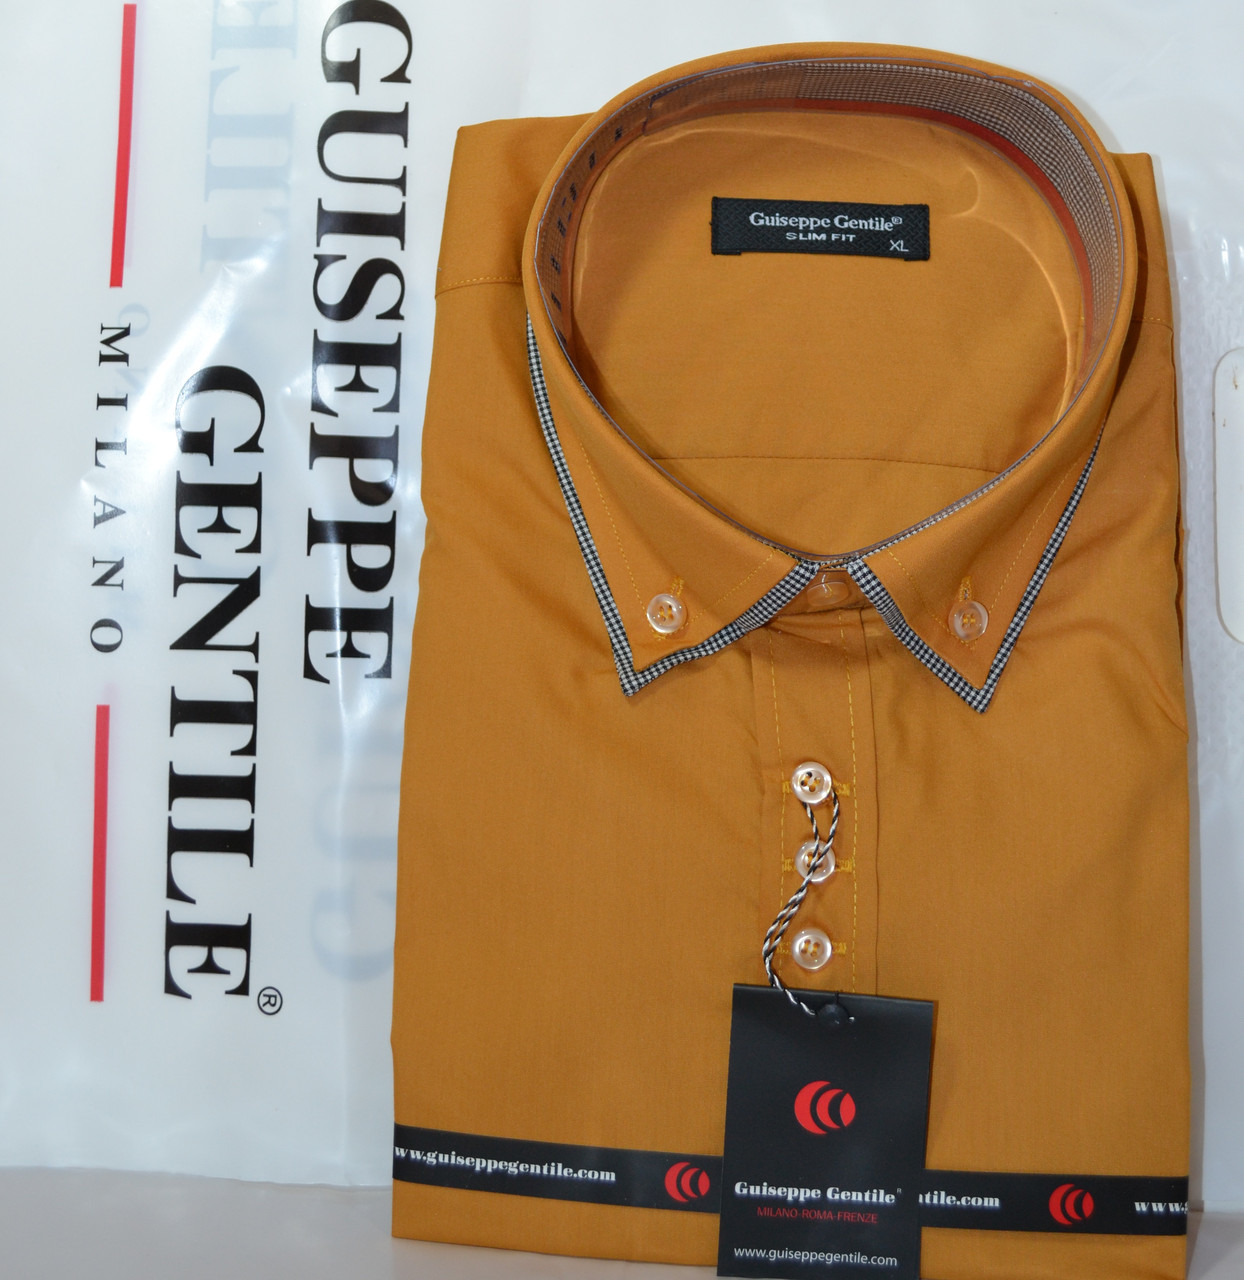 Приталенная рубашка с коротким рукавом под запонку Guiseppe Gentile (размеры XS.S.M.L.XL.XXL)